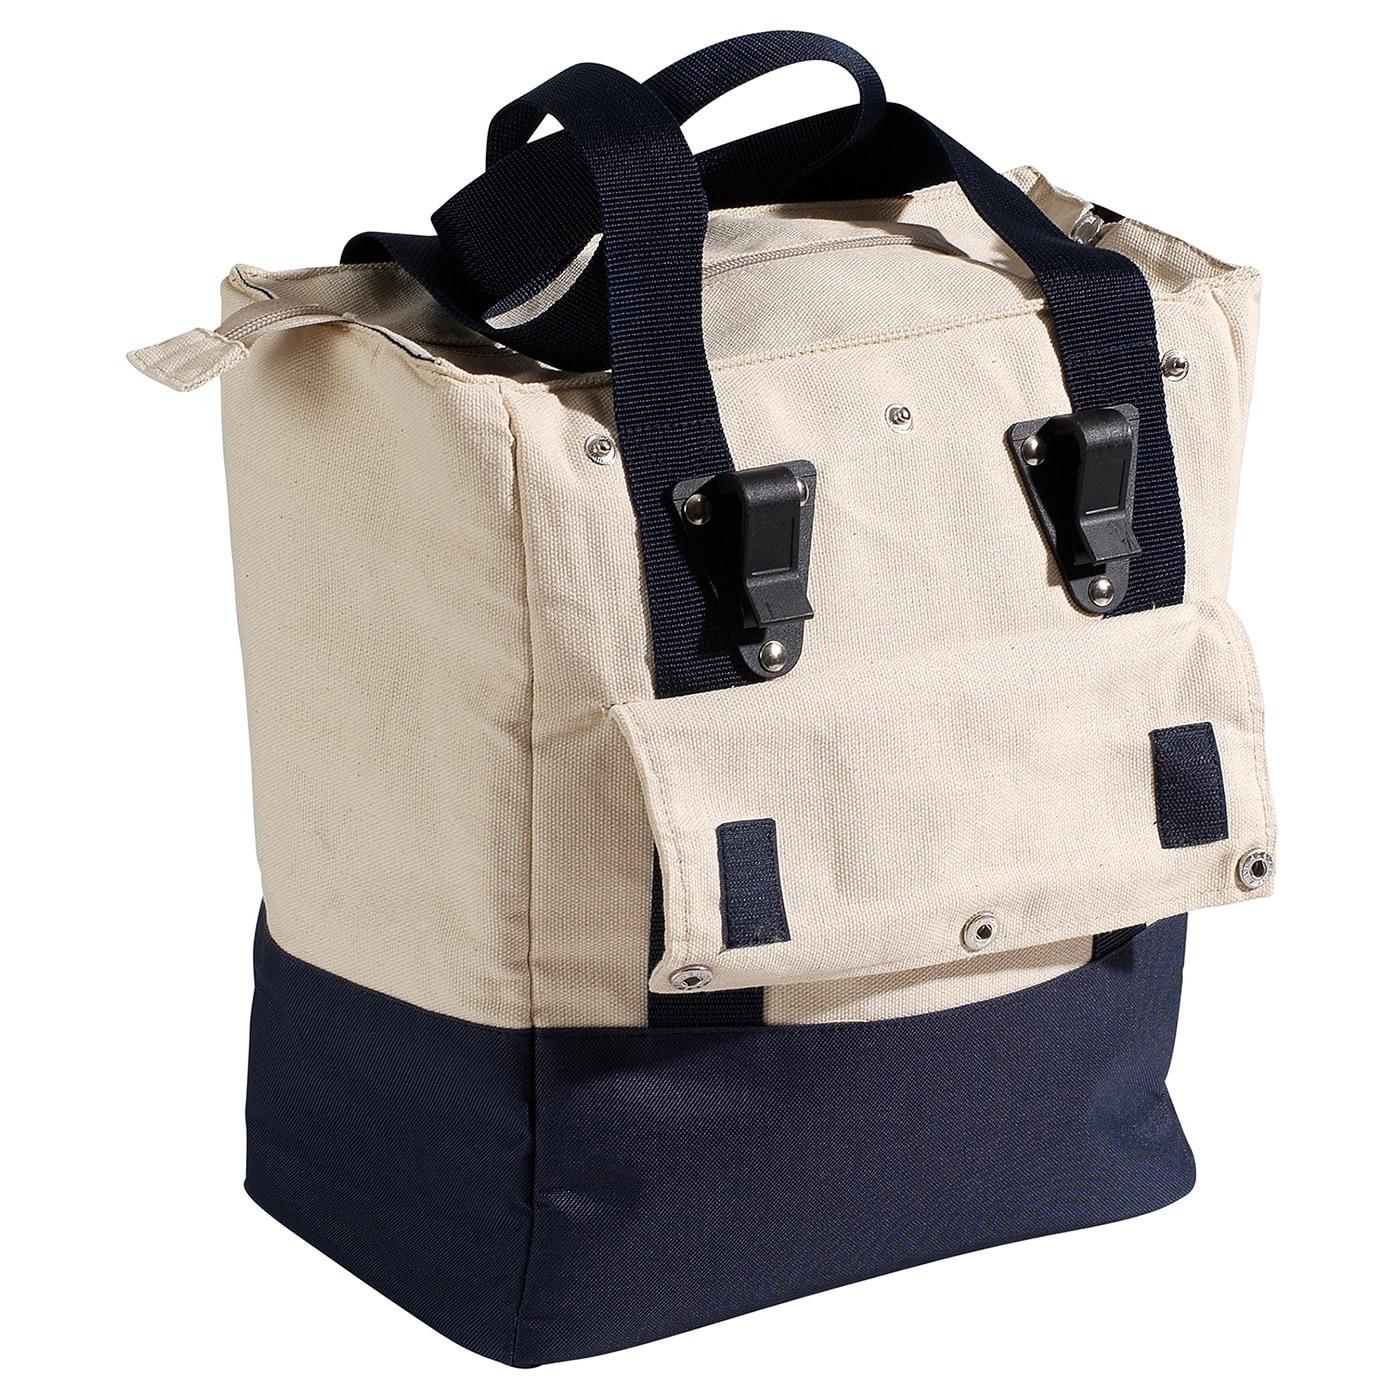 Nantucket Rear Portland Pannier Bag (Ivory/Navy Blue)